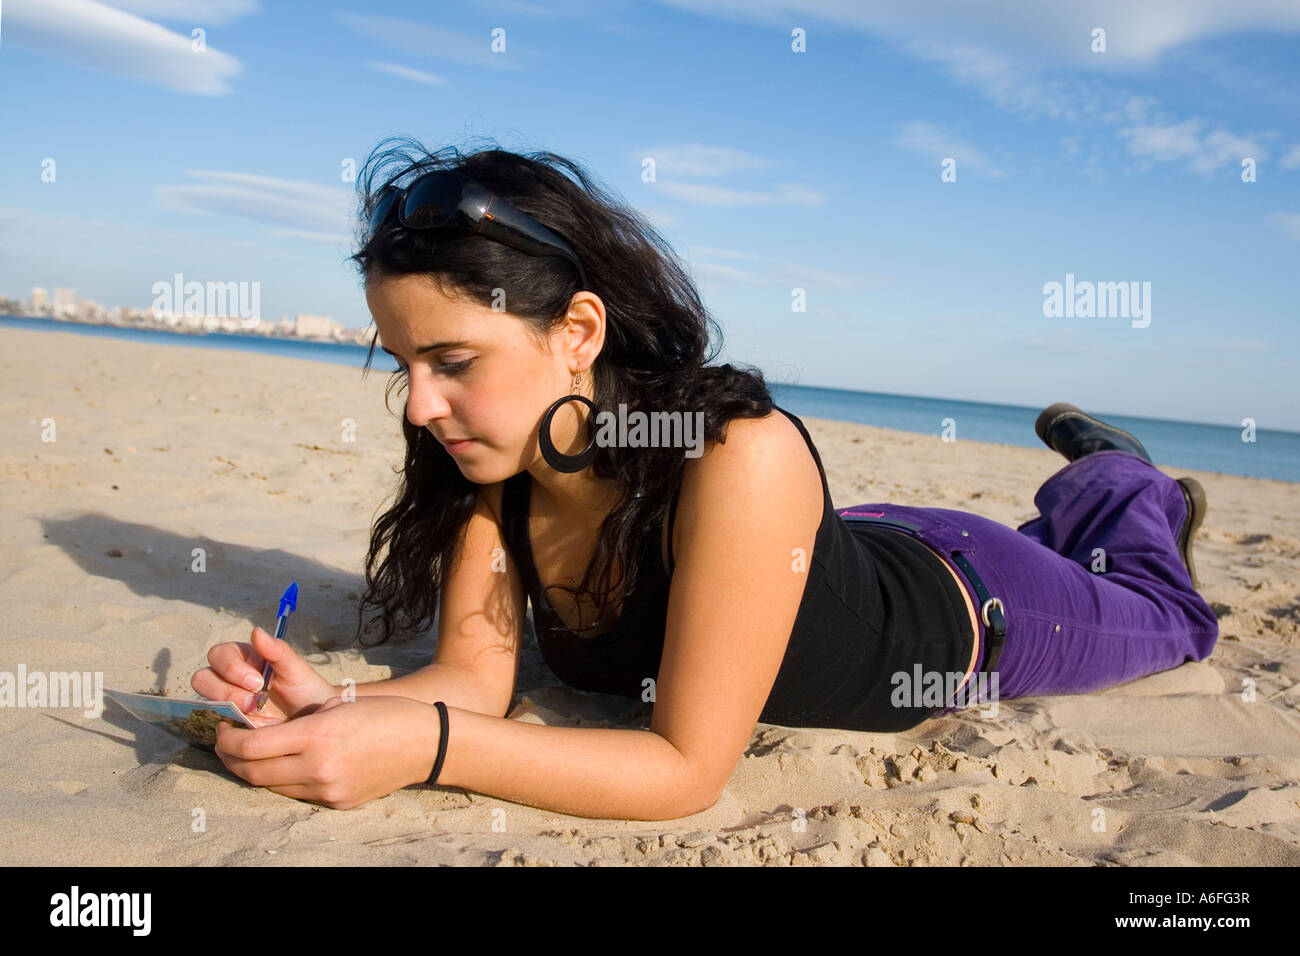 Young woman lying on beach. - Stock Image